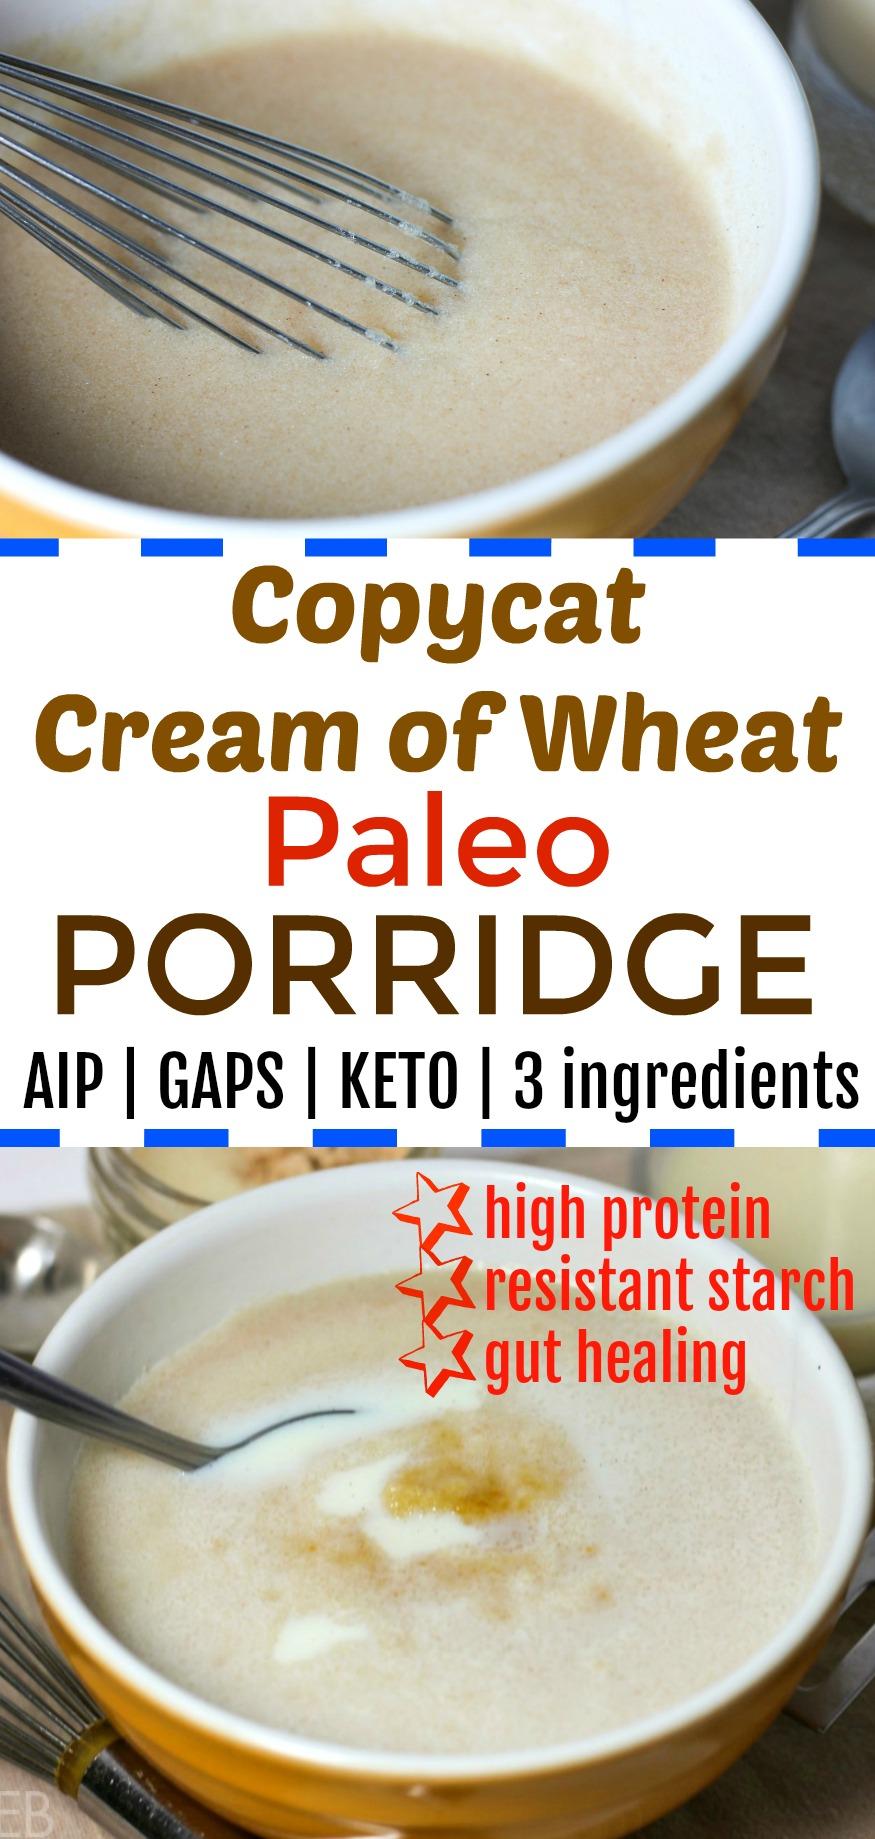 Paleo *Copycat Cream of Wheat* Porridge {gut-healing, 3 ingredients, GAPS, Keto, AIP} #paleobreakfast #paleoporridge #paleocereal #ketobreakfast #aipbreakfast #gapsdiet #creamofwheat